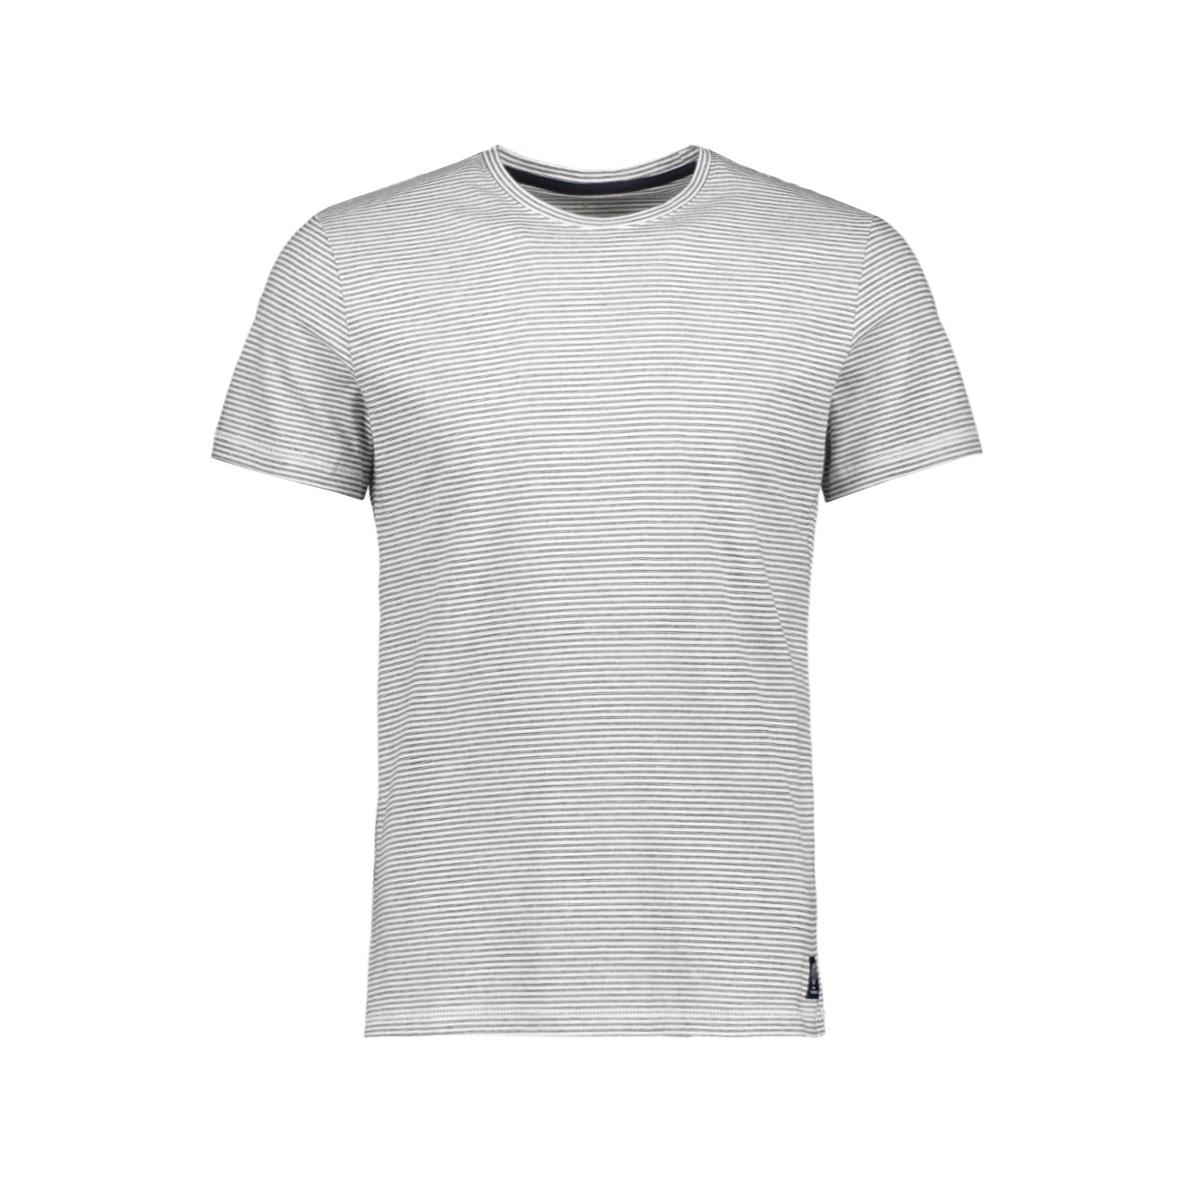 1008646xx10 tom tailor t-shirt 16152